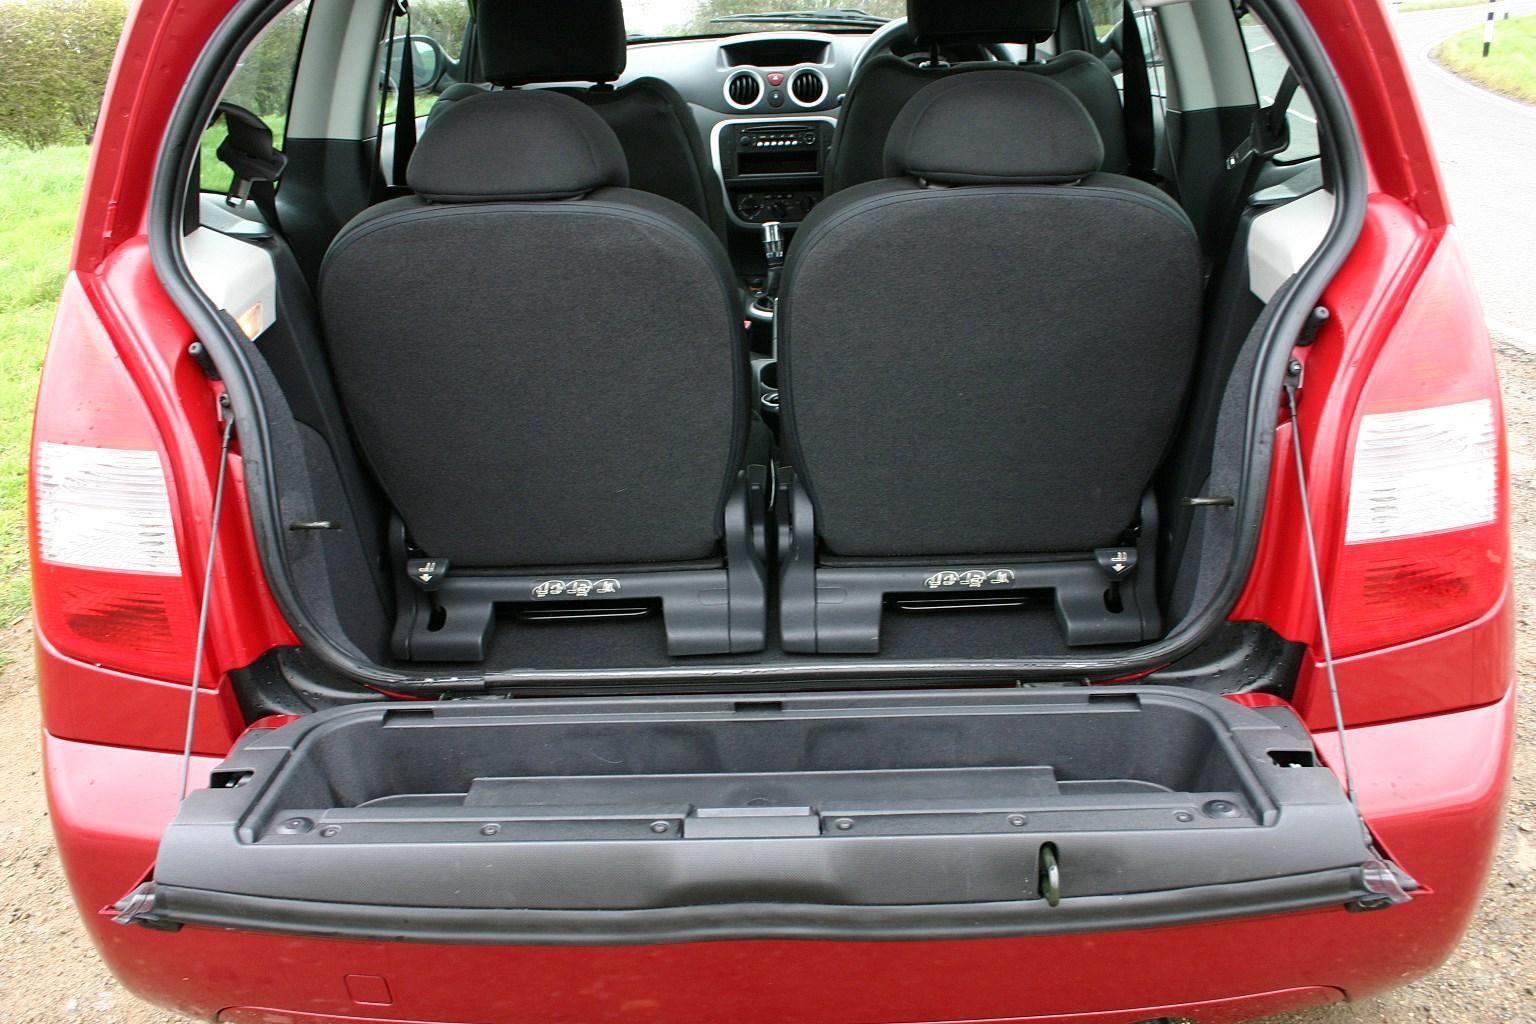 Used Citroën C2 Hatchback (2003 - 2009) Practicality | Parkers